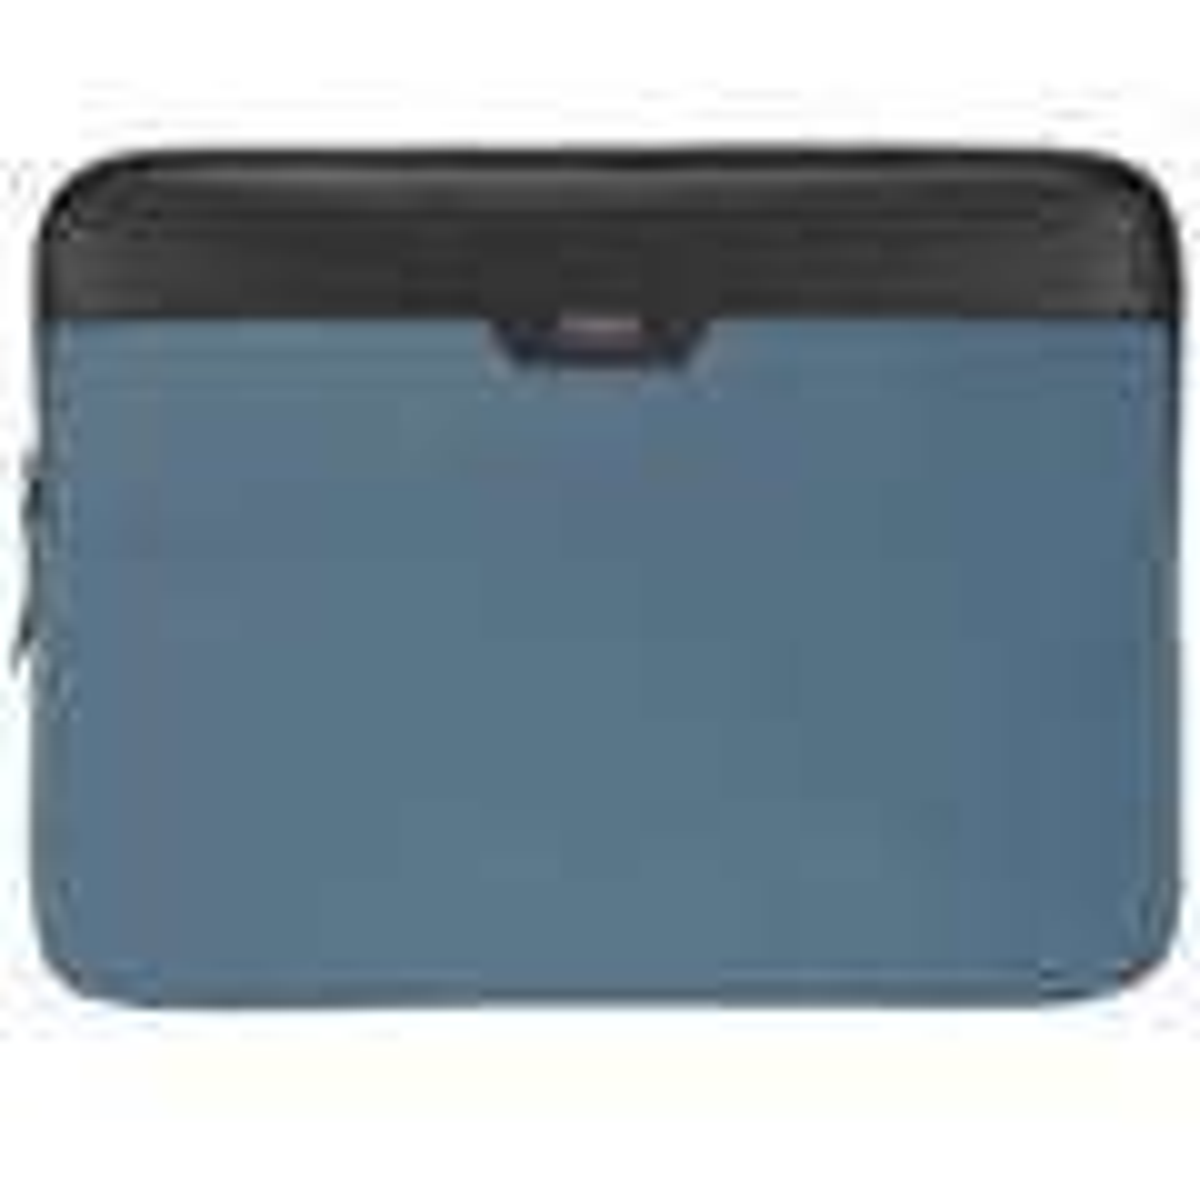 "Targus Newport TSS100002GL Carrying Case (Sleeve) for 35.6 cm (14"") Notebook - Blue"